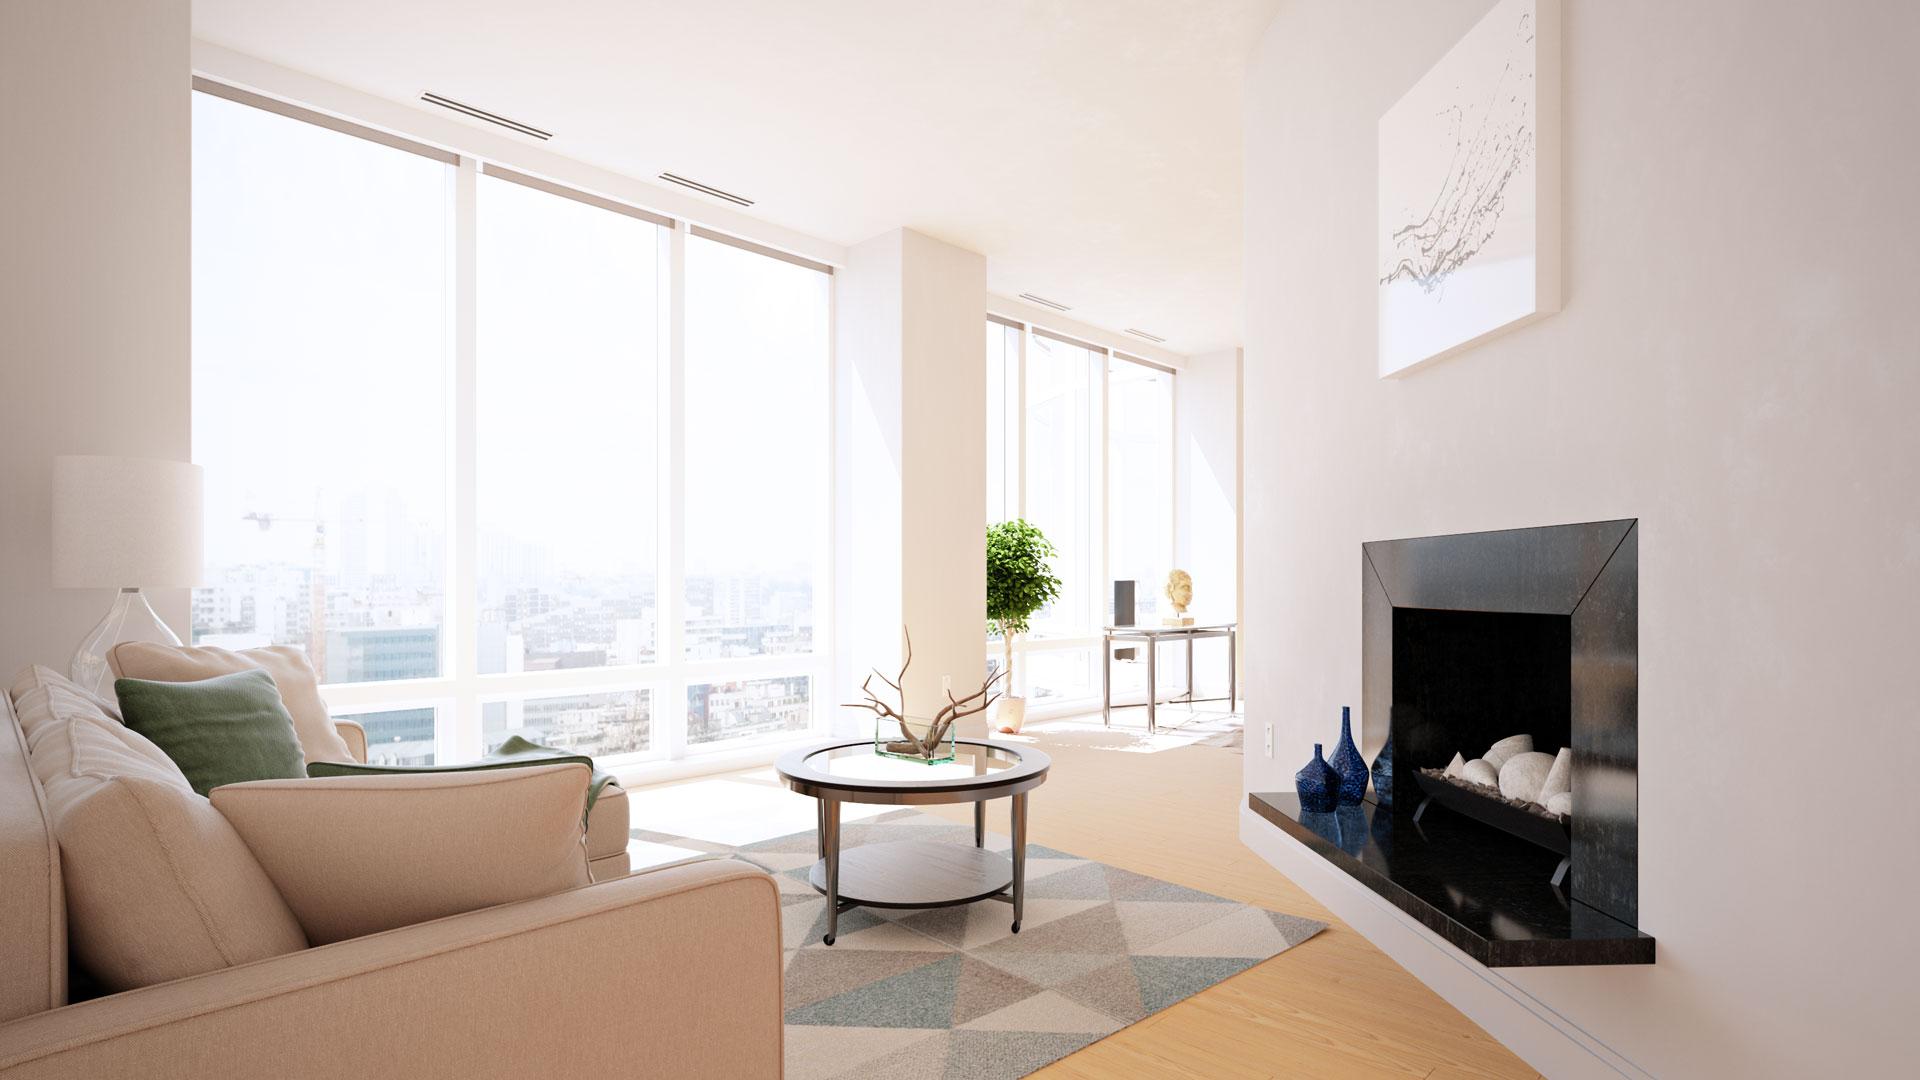 appartment-interior-1080.jpg